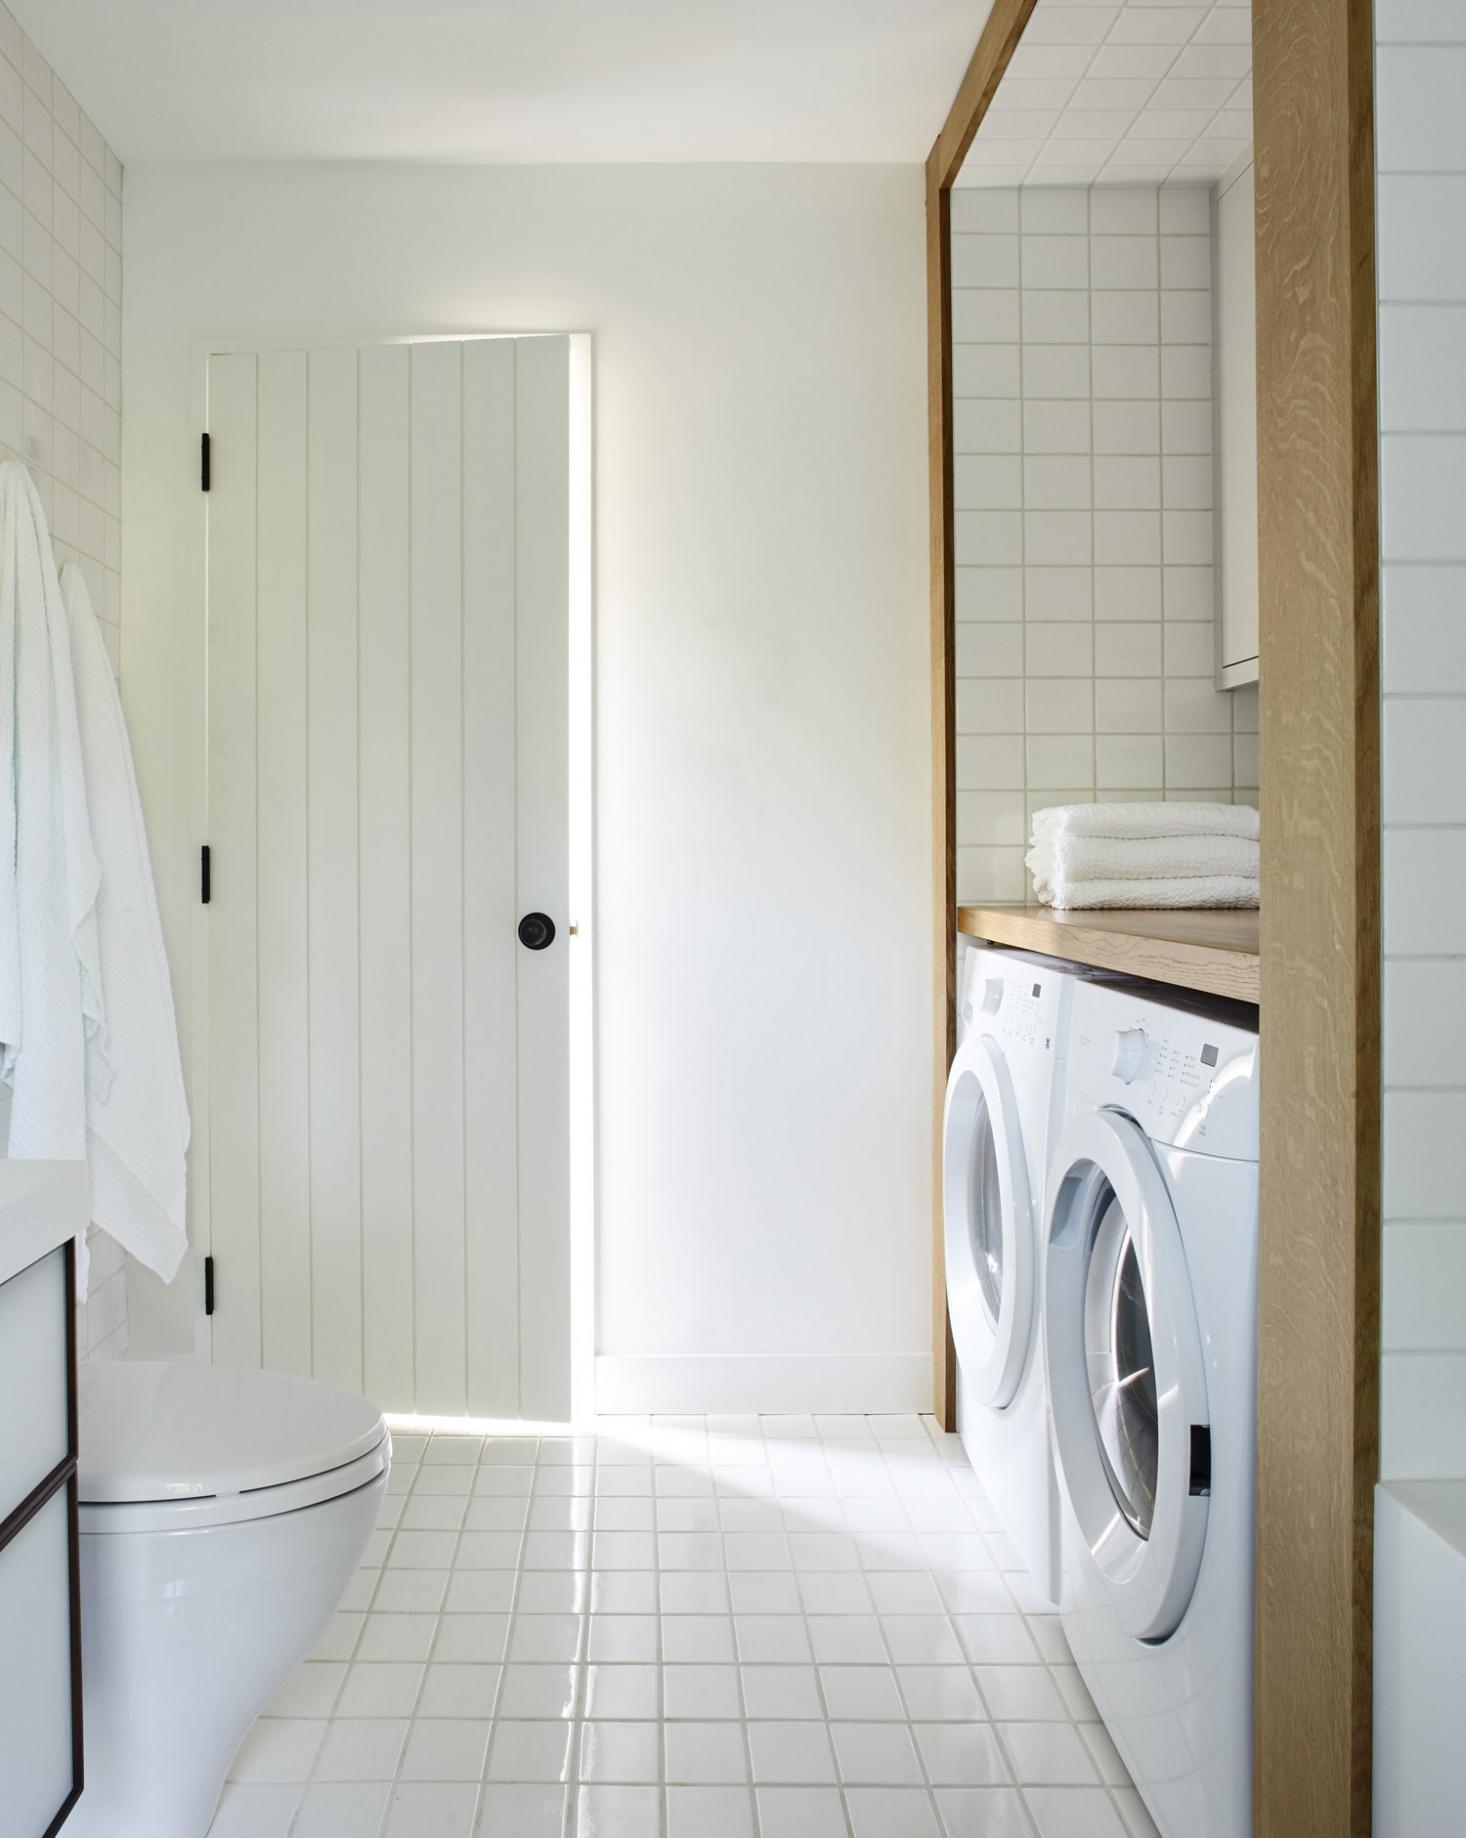 laundry-room-bathroom-chilmark-cottage-shiplap-door-1466x1838.jpg